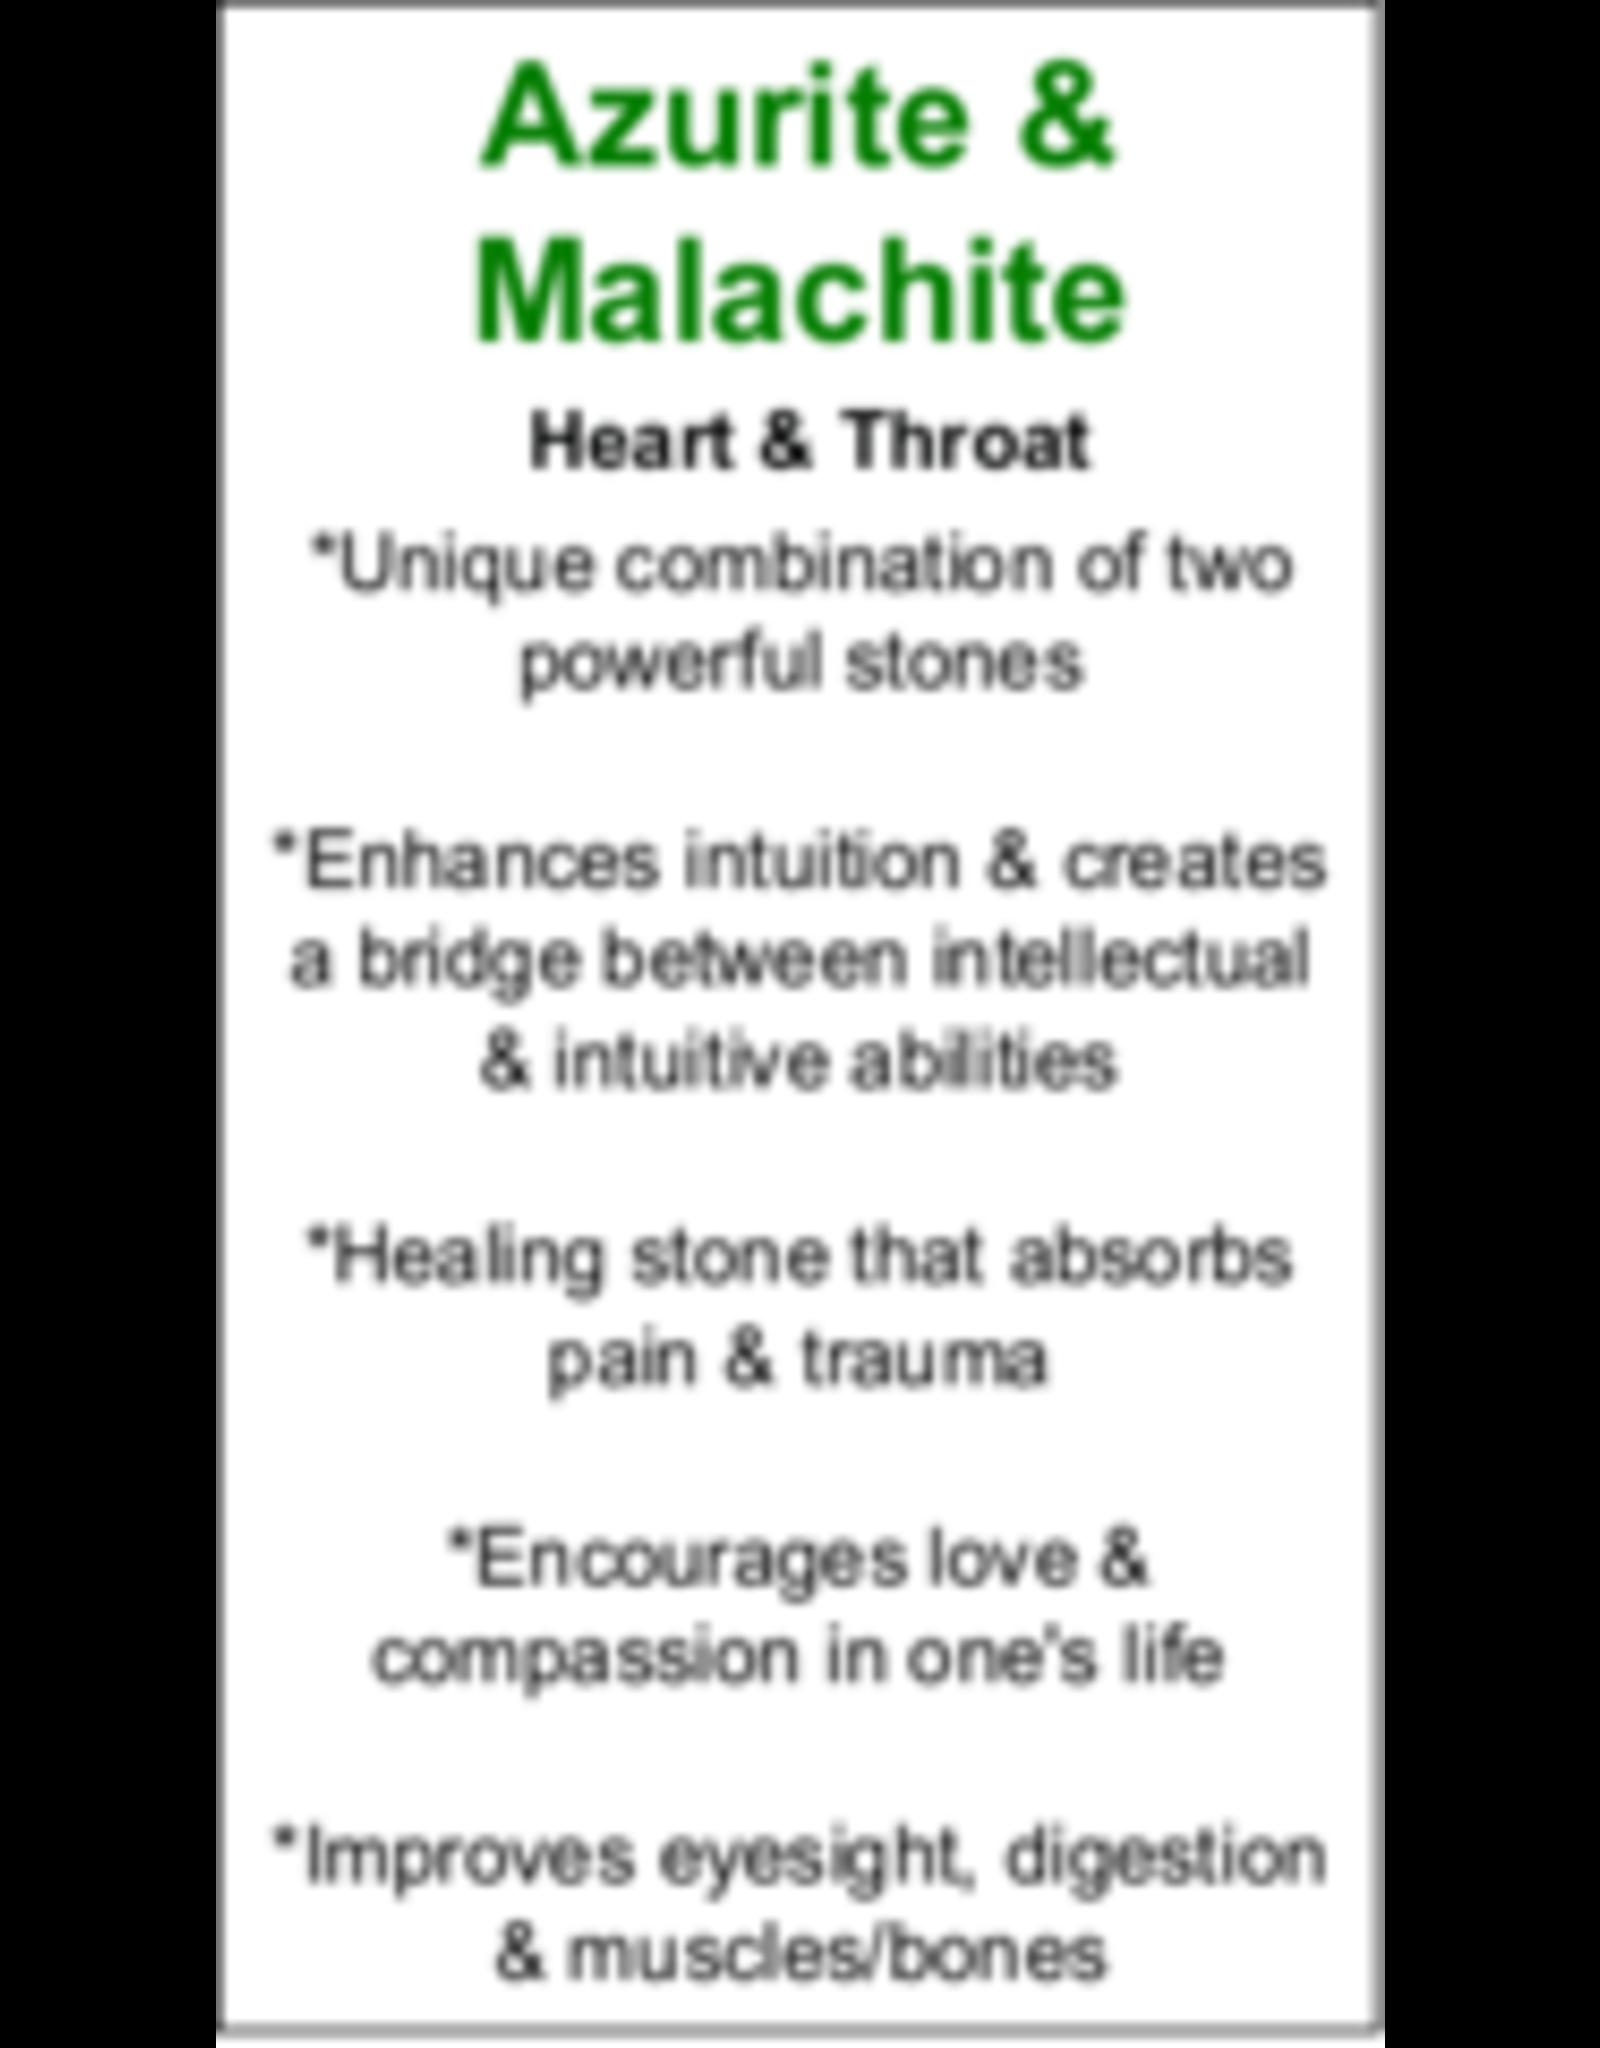 Boulder Azurite Malachite Pendant #2 - Pointed Oval